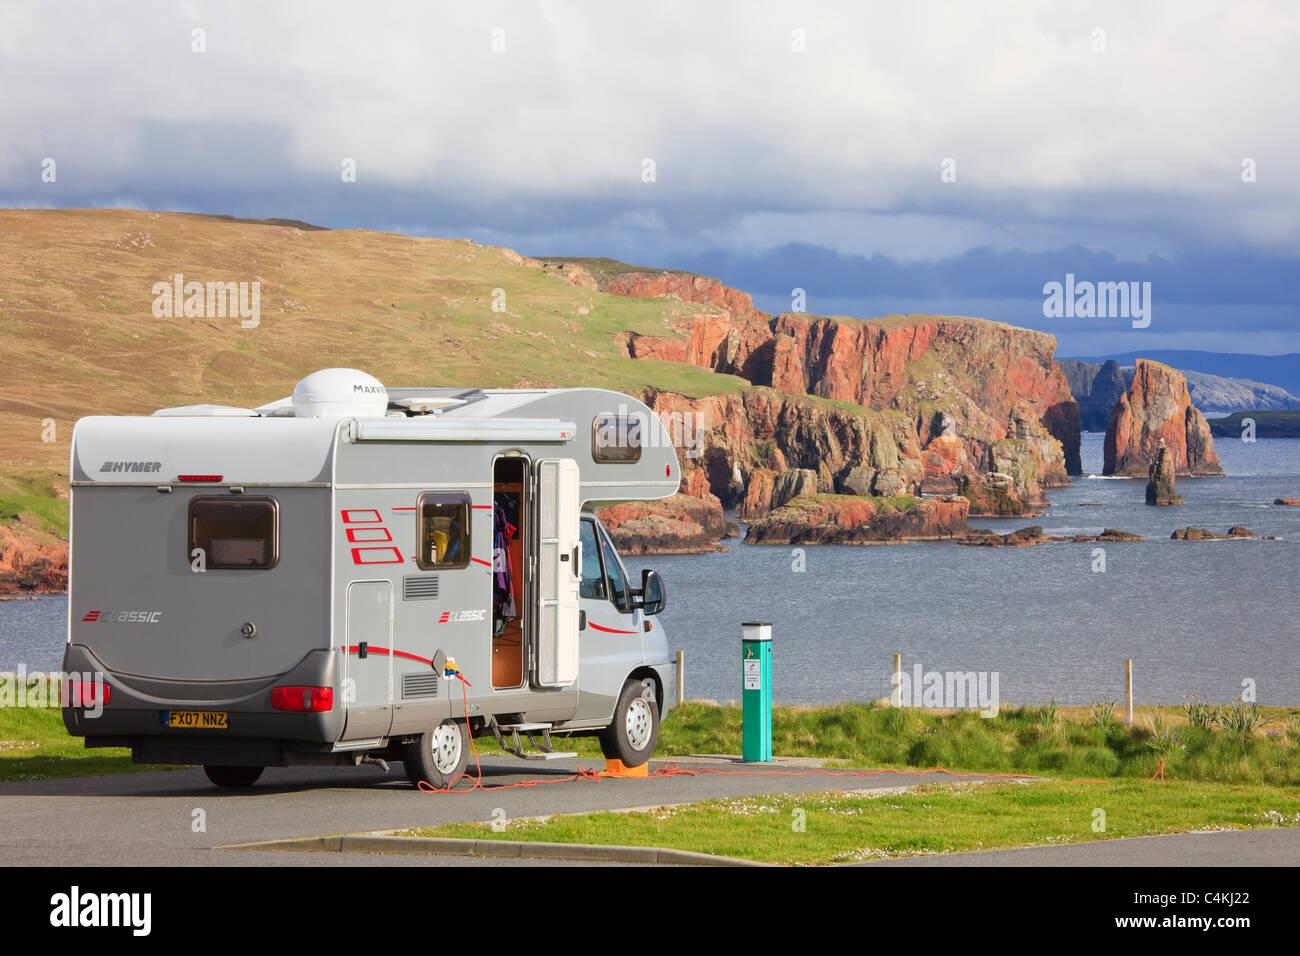 Motorhome in Braewick campsite overlooking the Drongs sea stacks on rugged coastline. Eshaness, Shetland Islands, - Stock Image